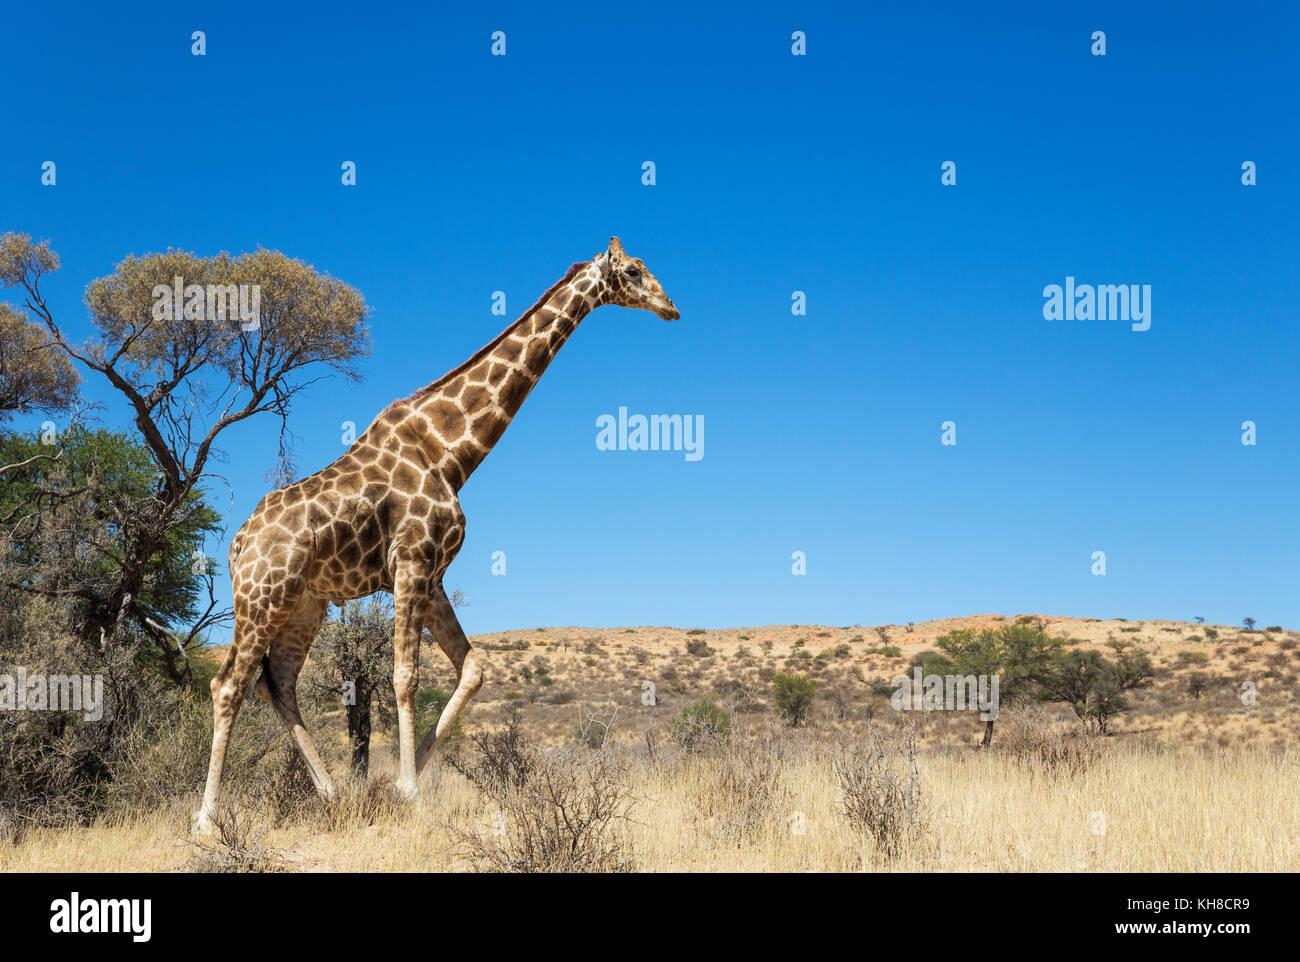 Southern Giraffe (Giraffa giraffa), aged male, Kalahari Desert, Kgalagadi Transfrontier Park, South Africa - Stock Image